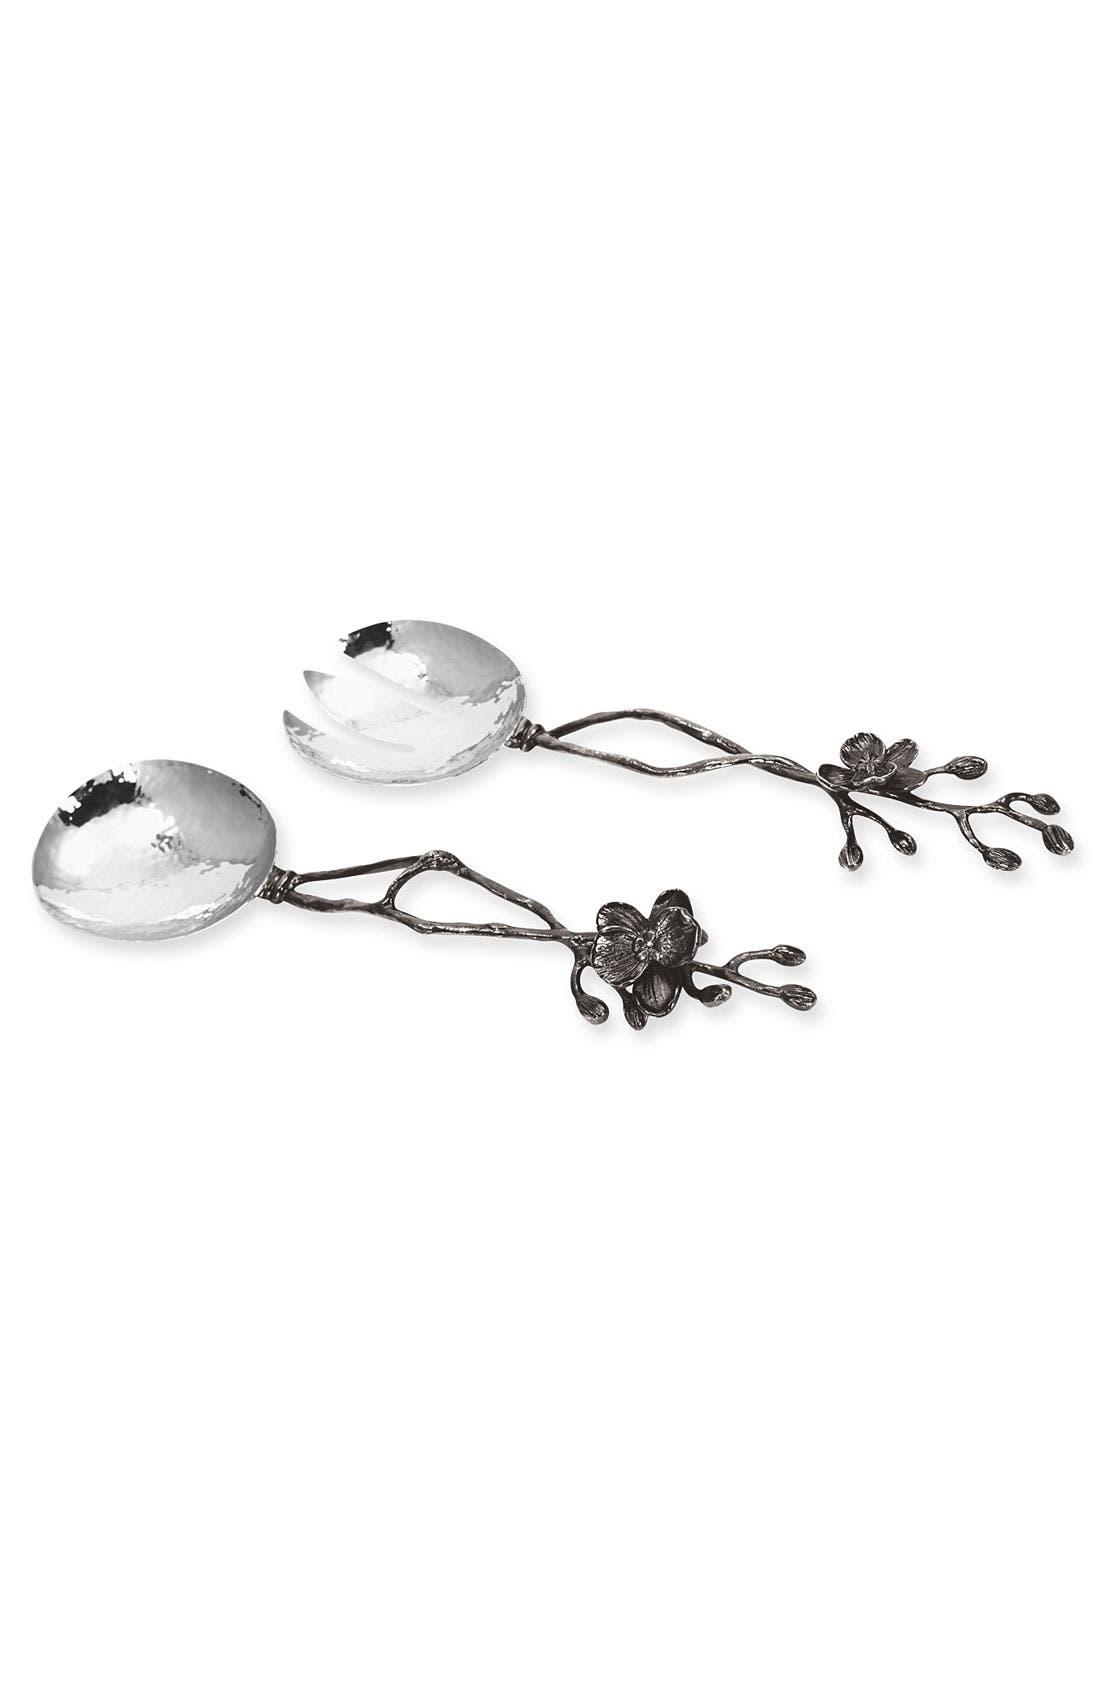 Alternate Image 1 Selected - Michael Aram 'Black Orchid' 2-Piece Salad Serving Set